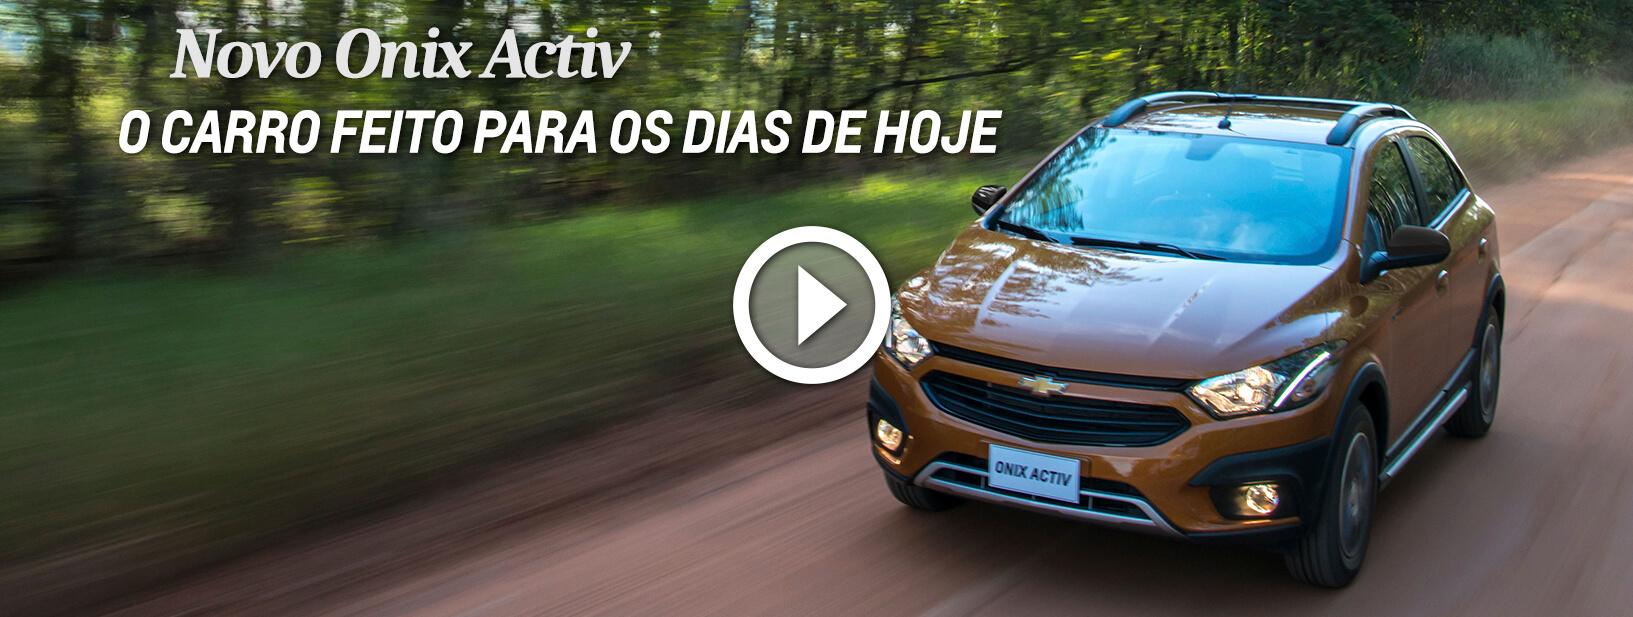 onix_activ_video